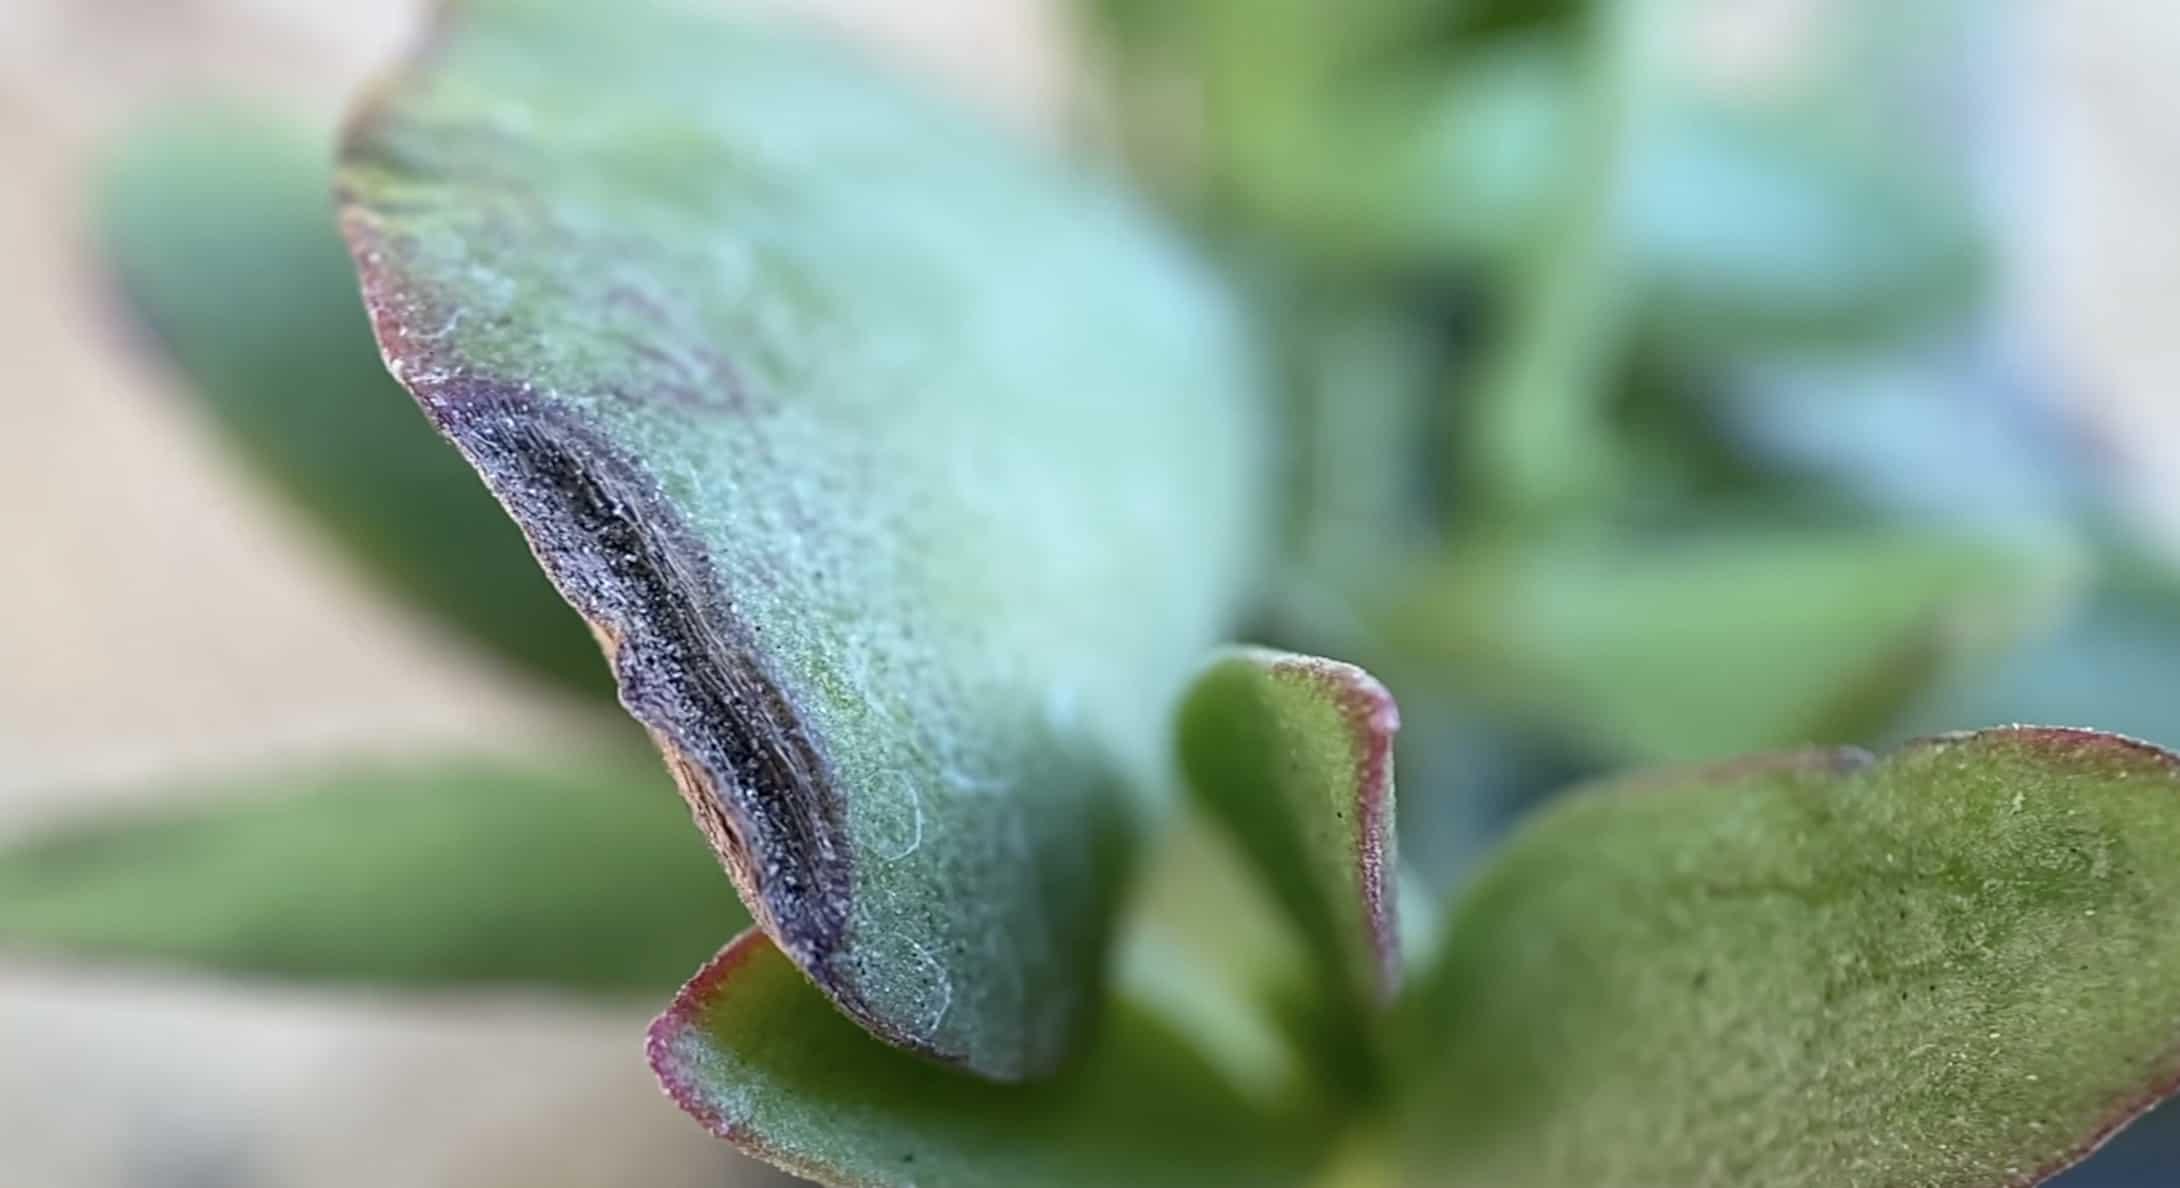 crassula pubescens ssp. radicans large red carpet stonecrop mountain crest gardens unboxing